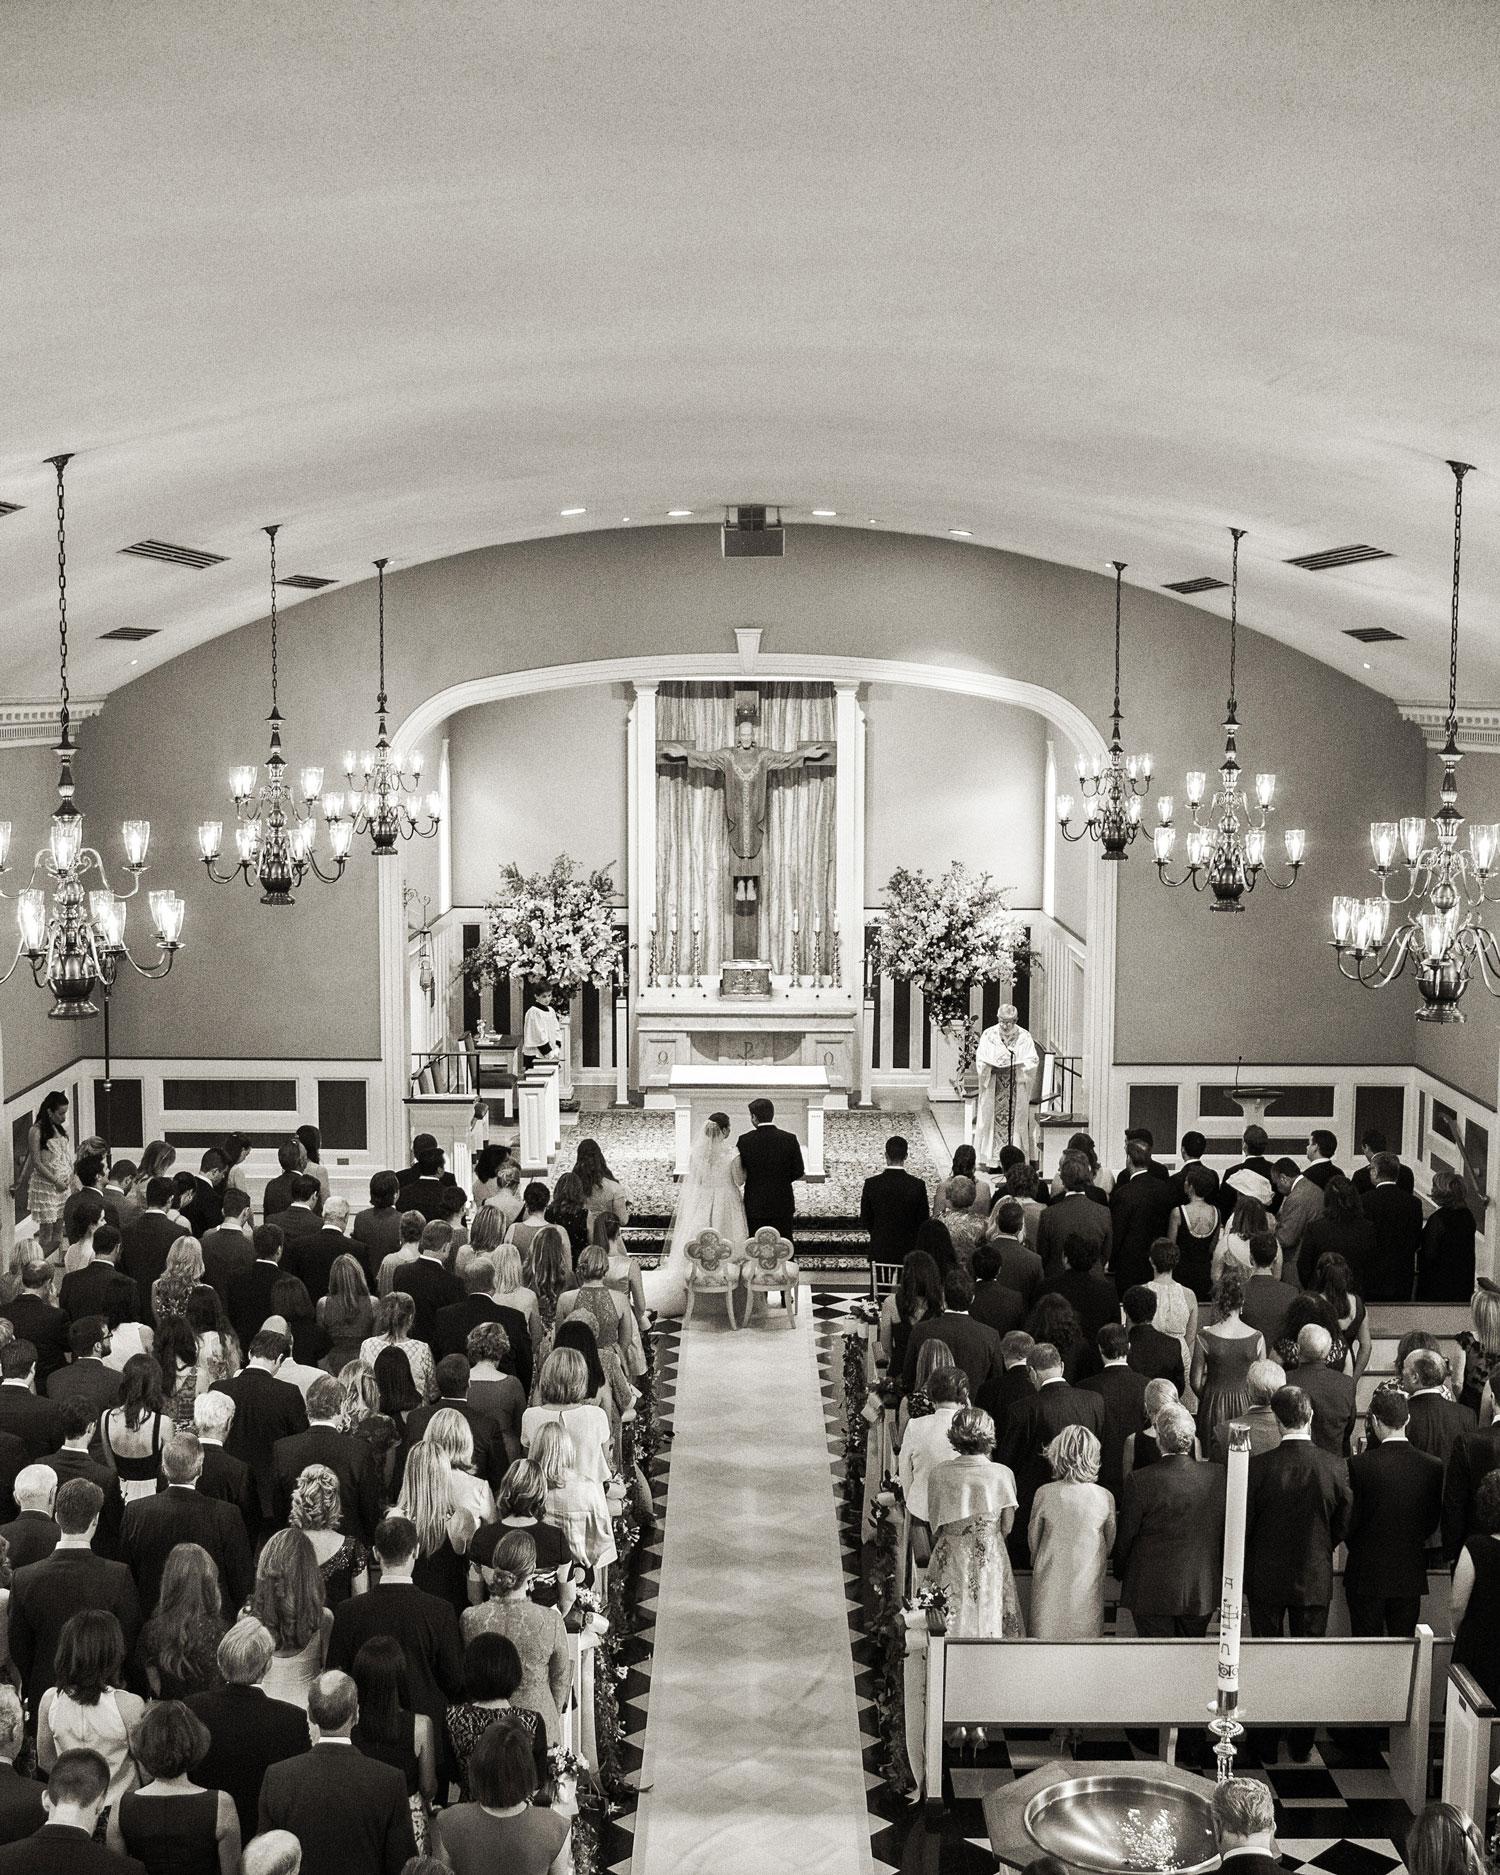 emily-matthew-wedding-ceremony-0067-s112720-0316.jpg